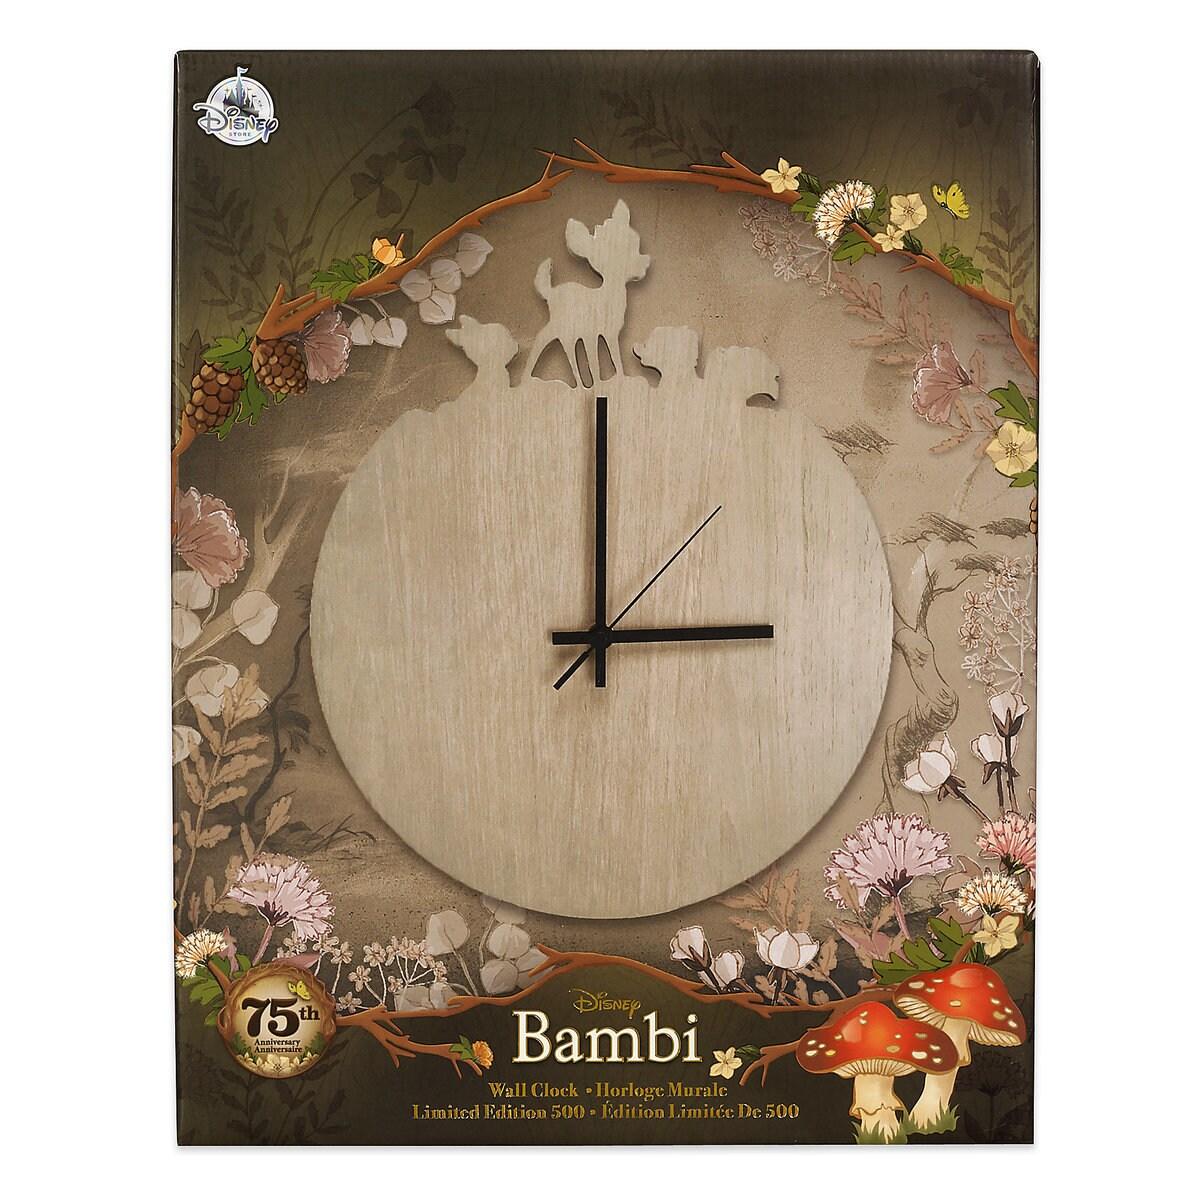 Bambi 75th anniversary wall clock limited edition shopdisney bambi 75th anniversary wall clock limited edition amipublicfo Choice Image